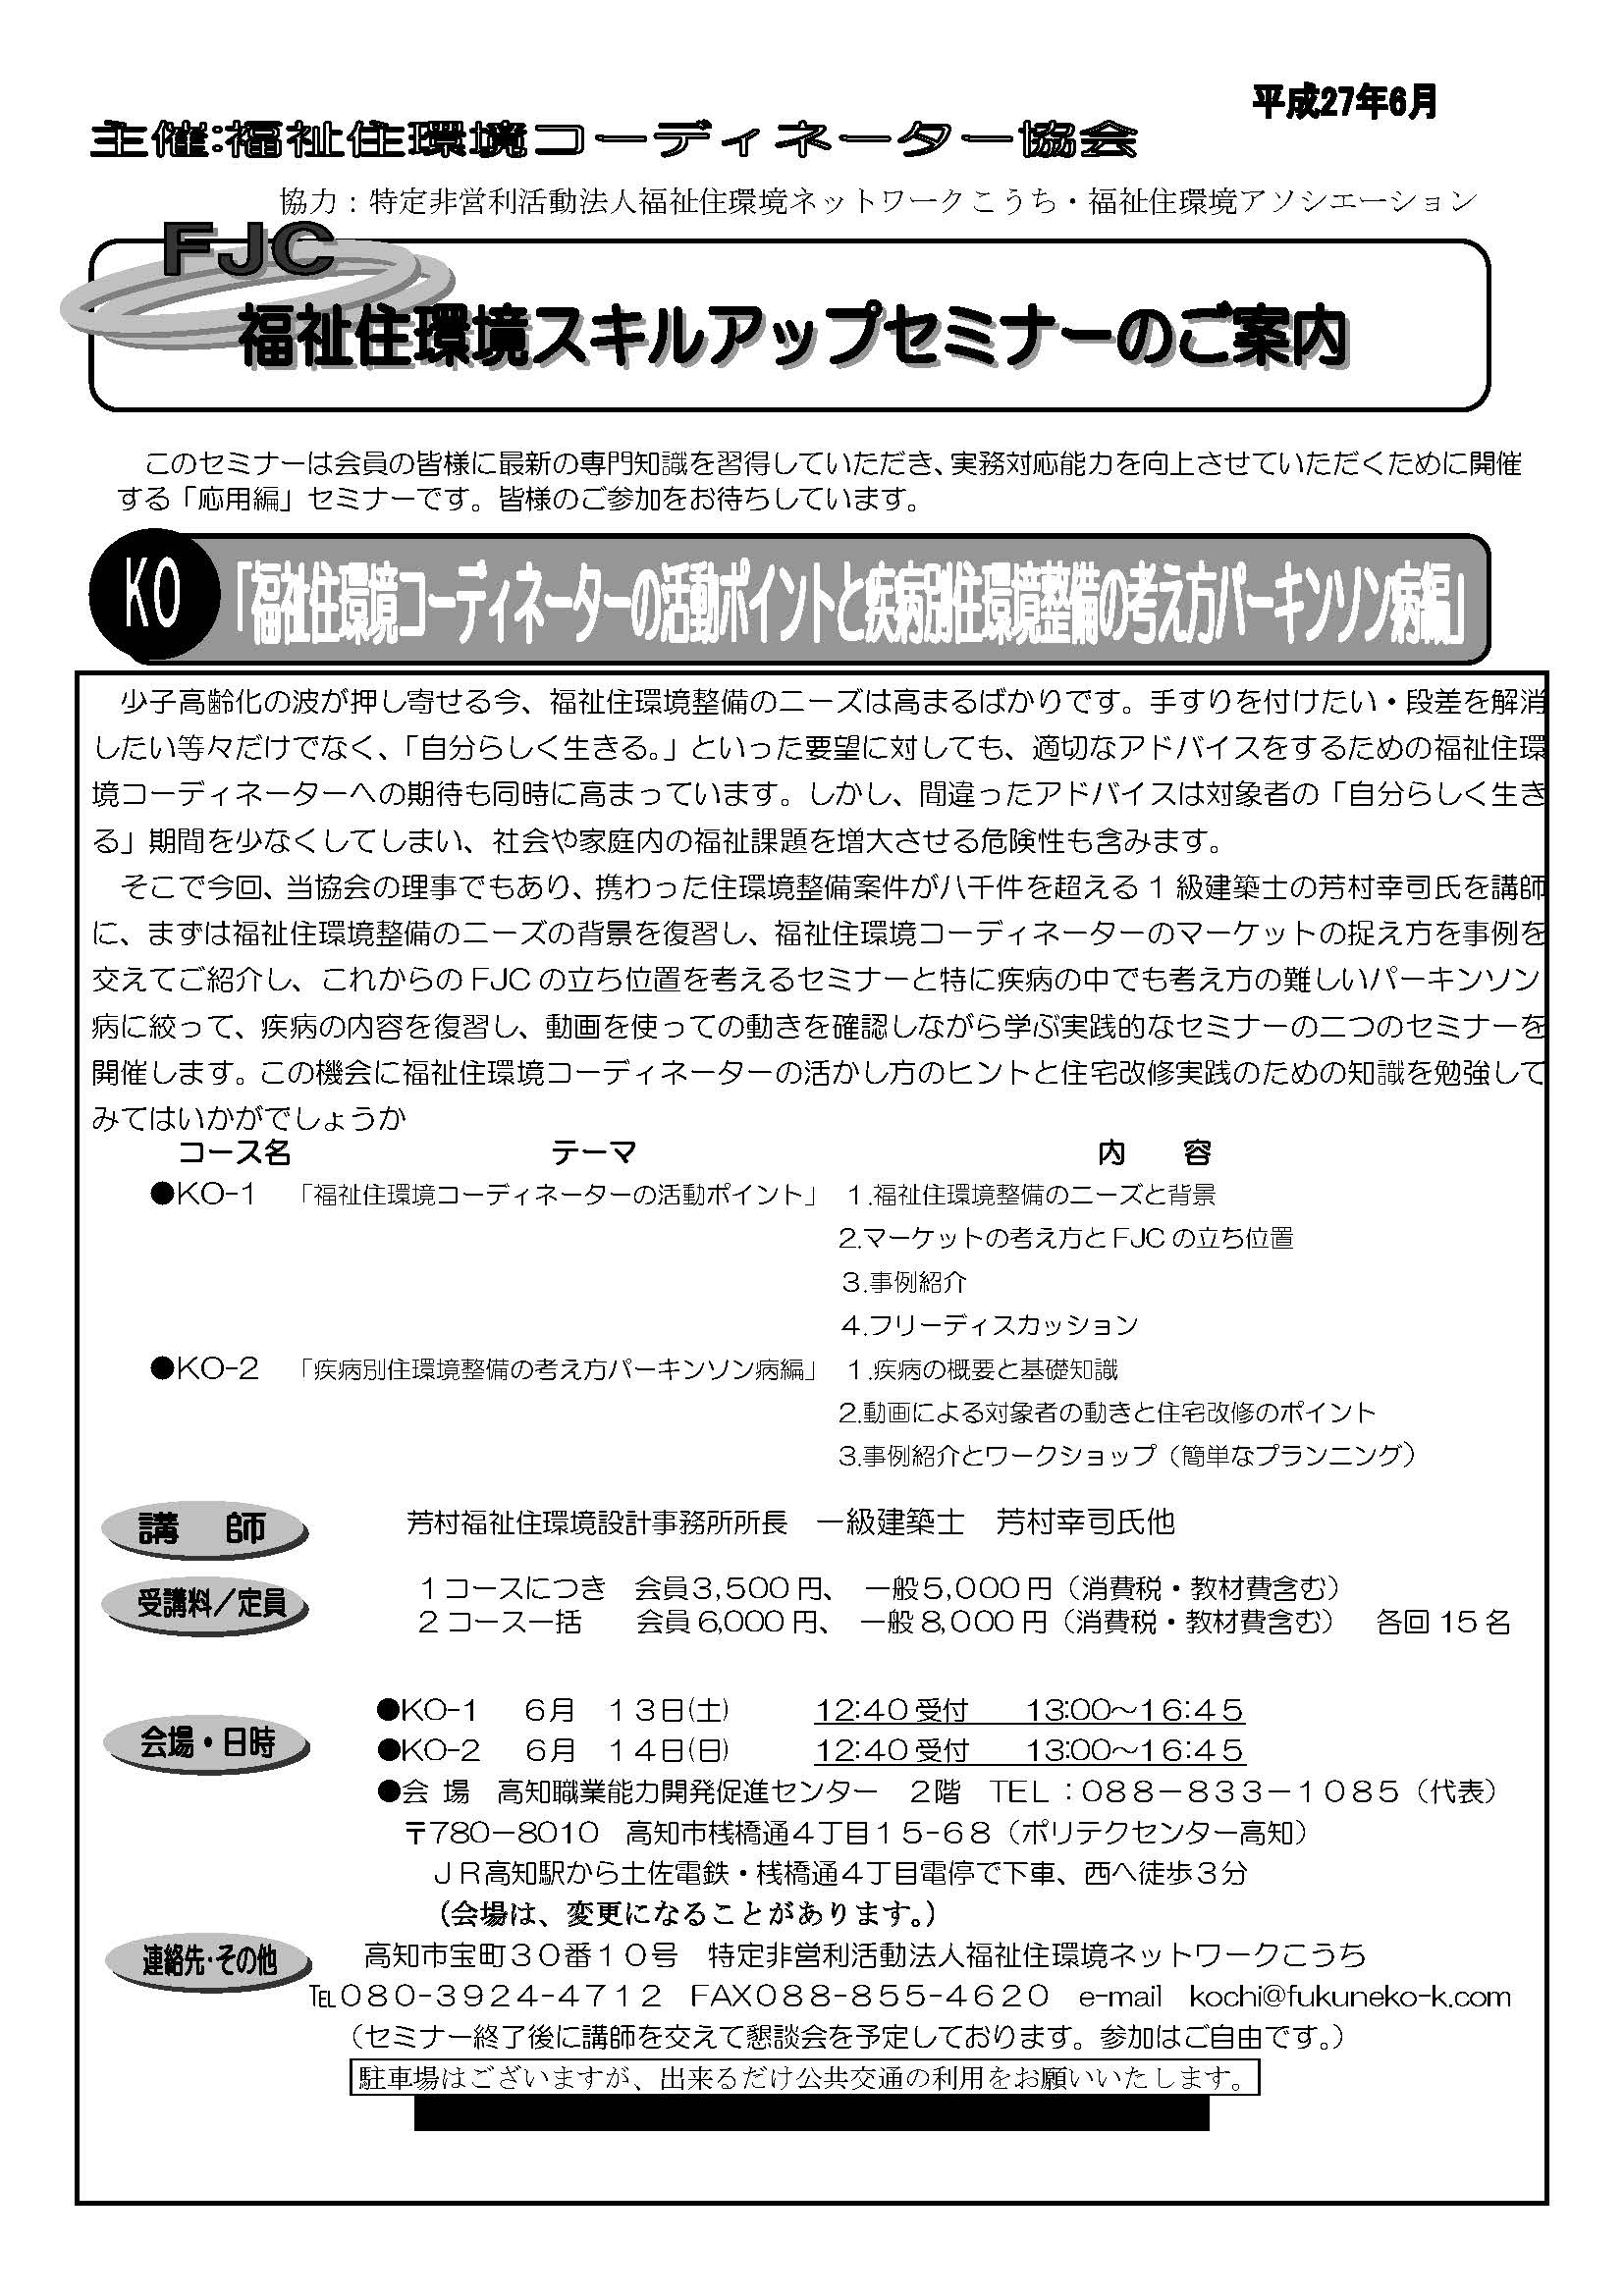 KO-1・CKO-2 FJCの活動ポイント・疾病別パーキンソン(高知)_ページ_1